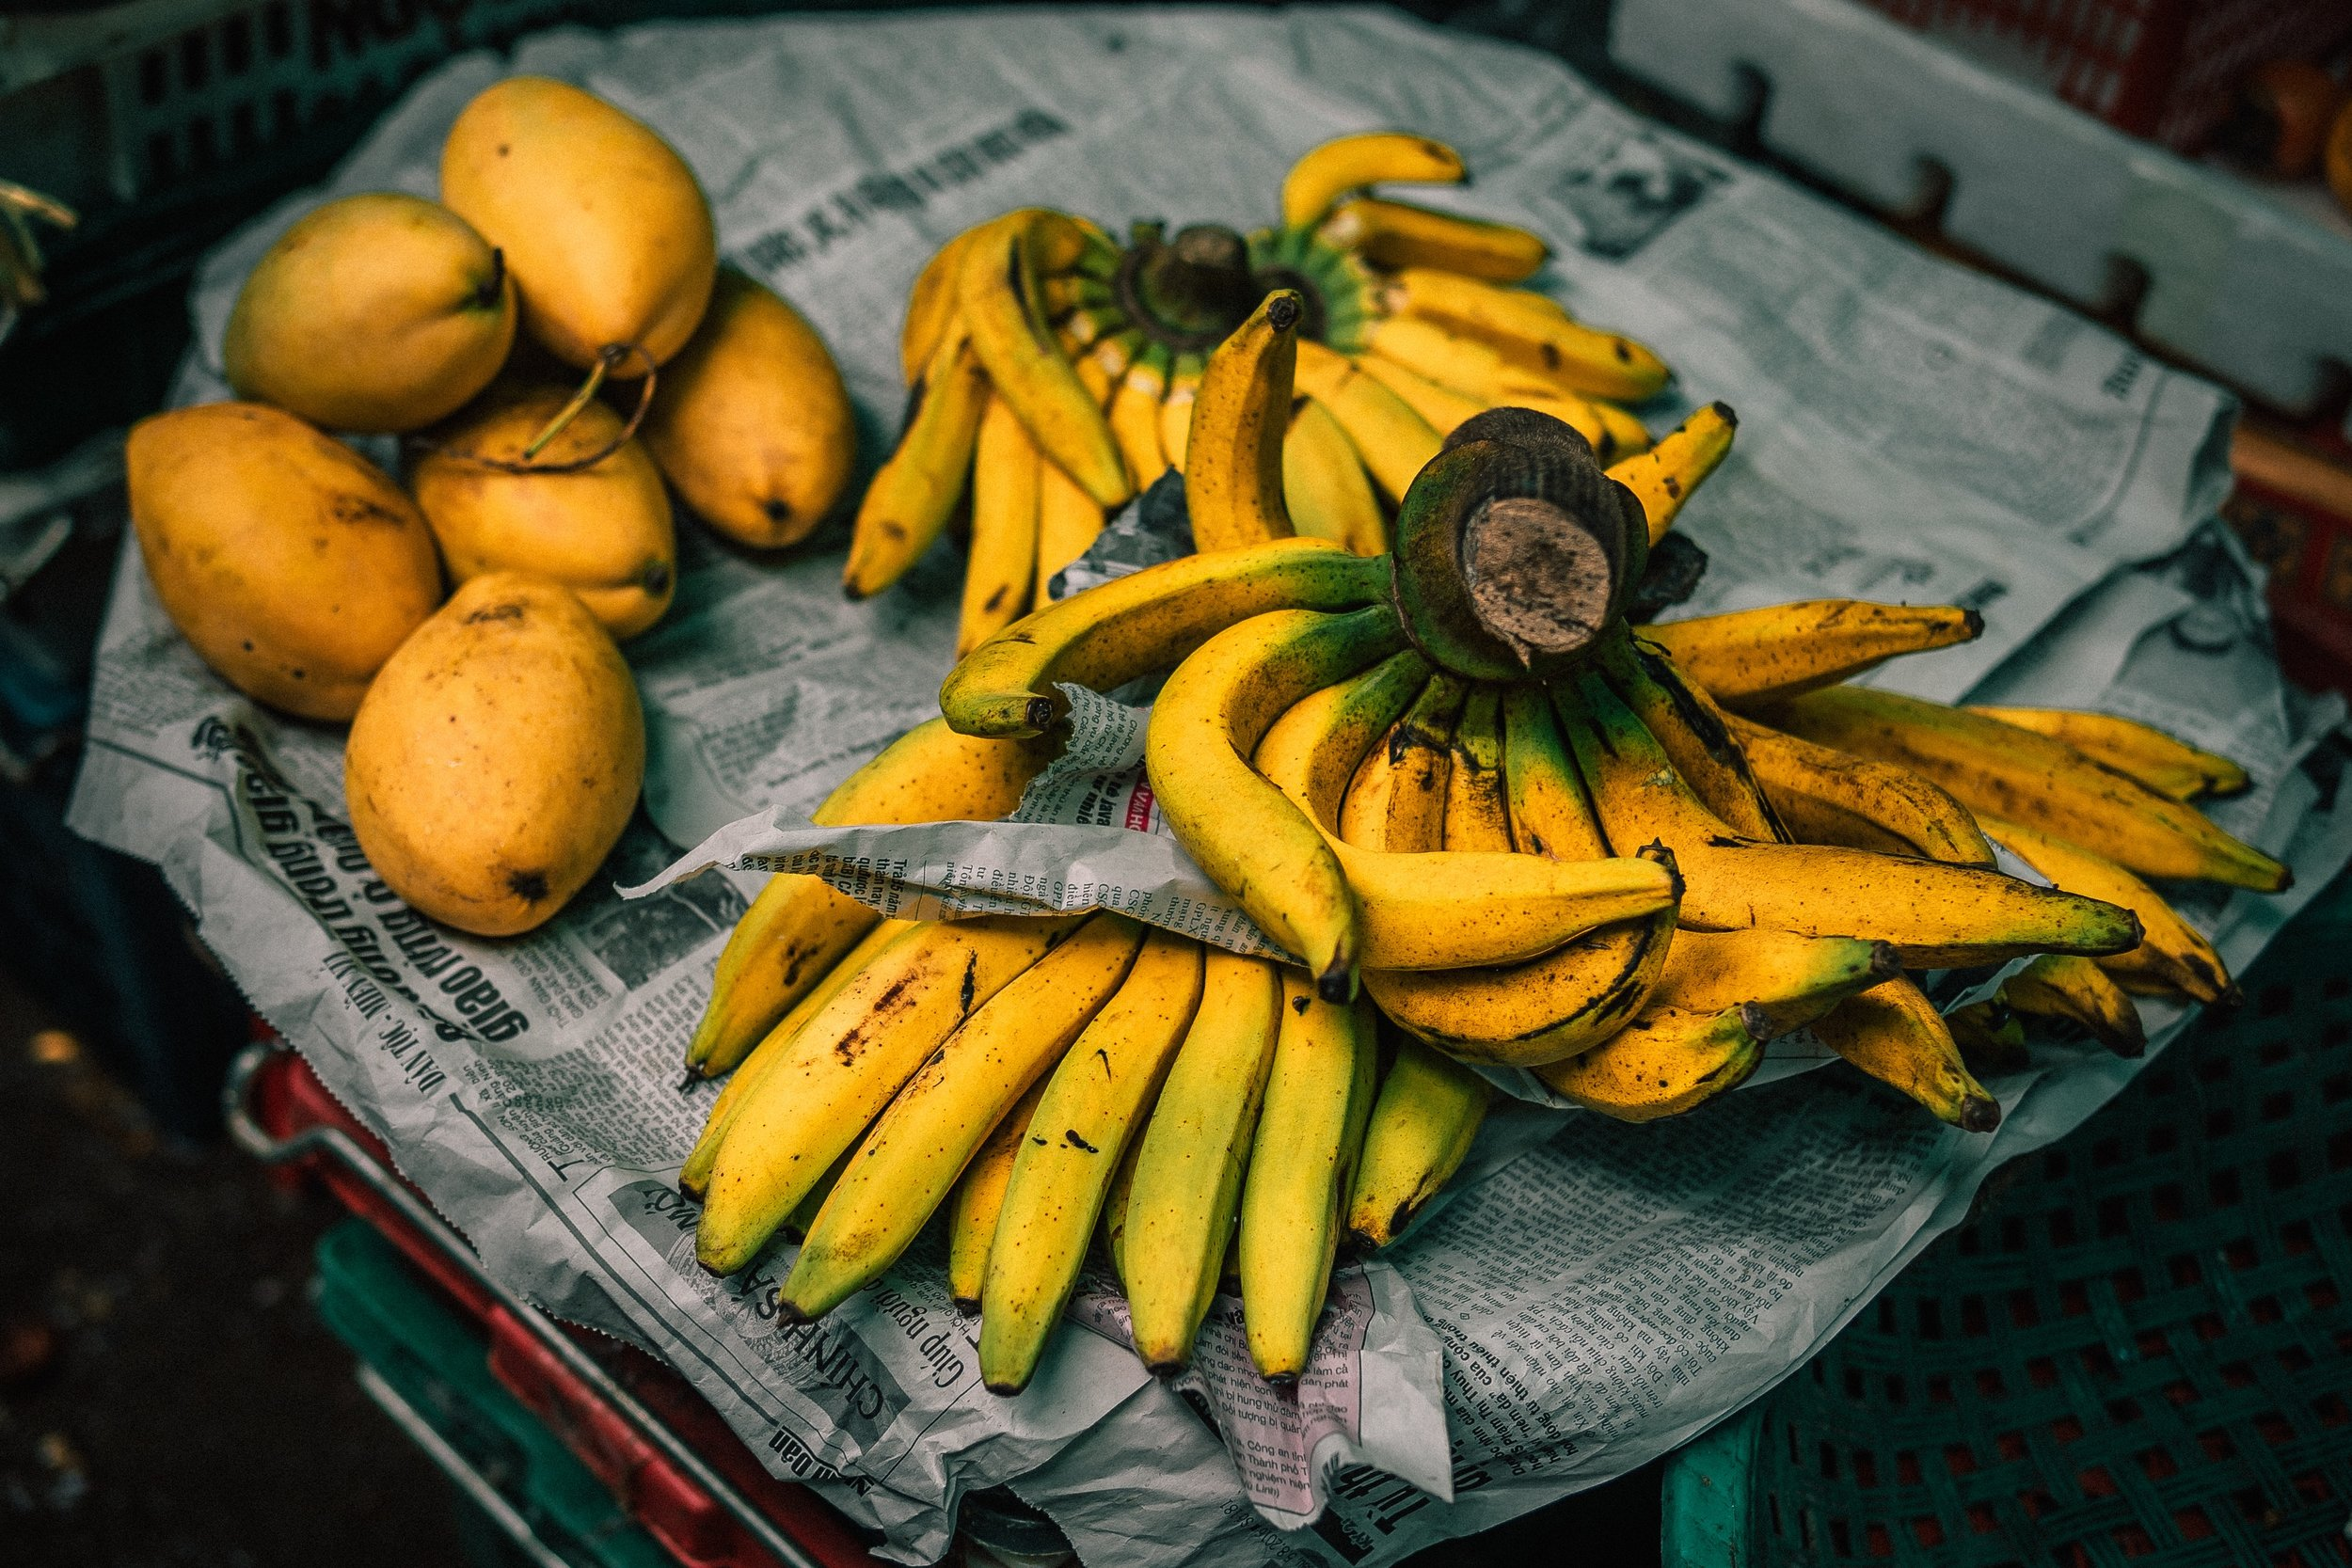 13 WEEKS AGO I BEGAN WORKING ON A BANANA FARM IN AUSTRALIA -